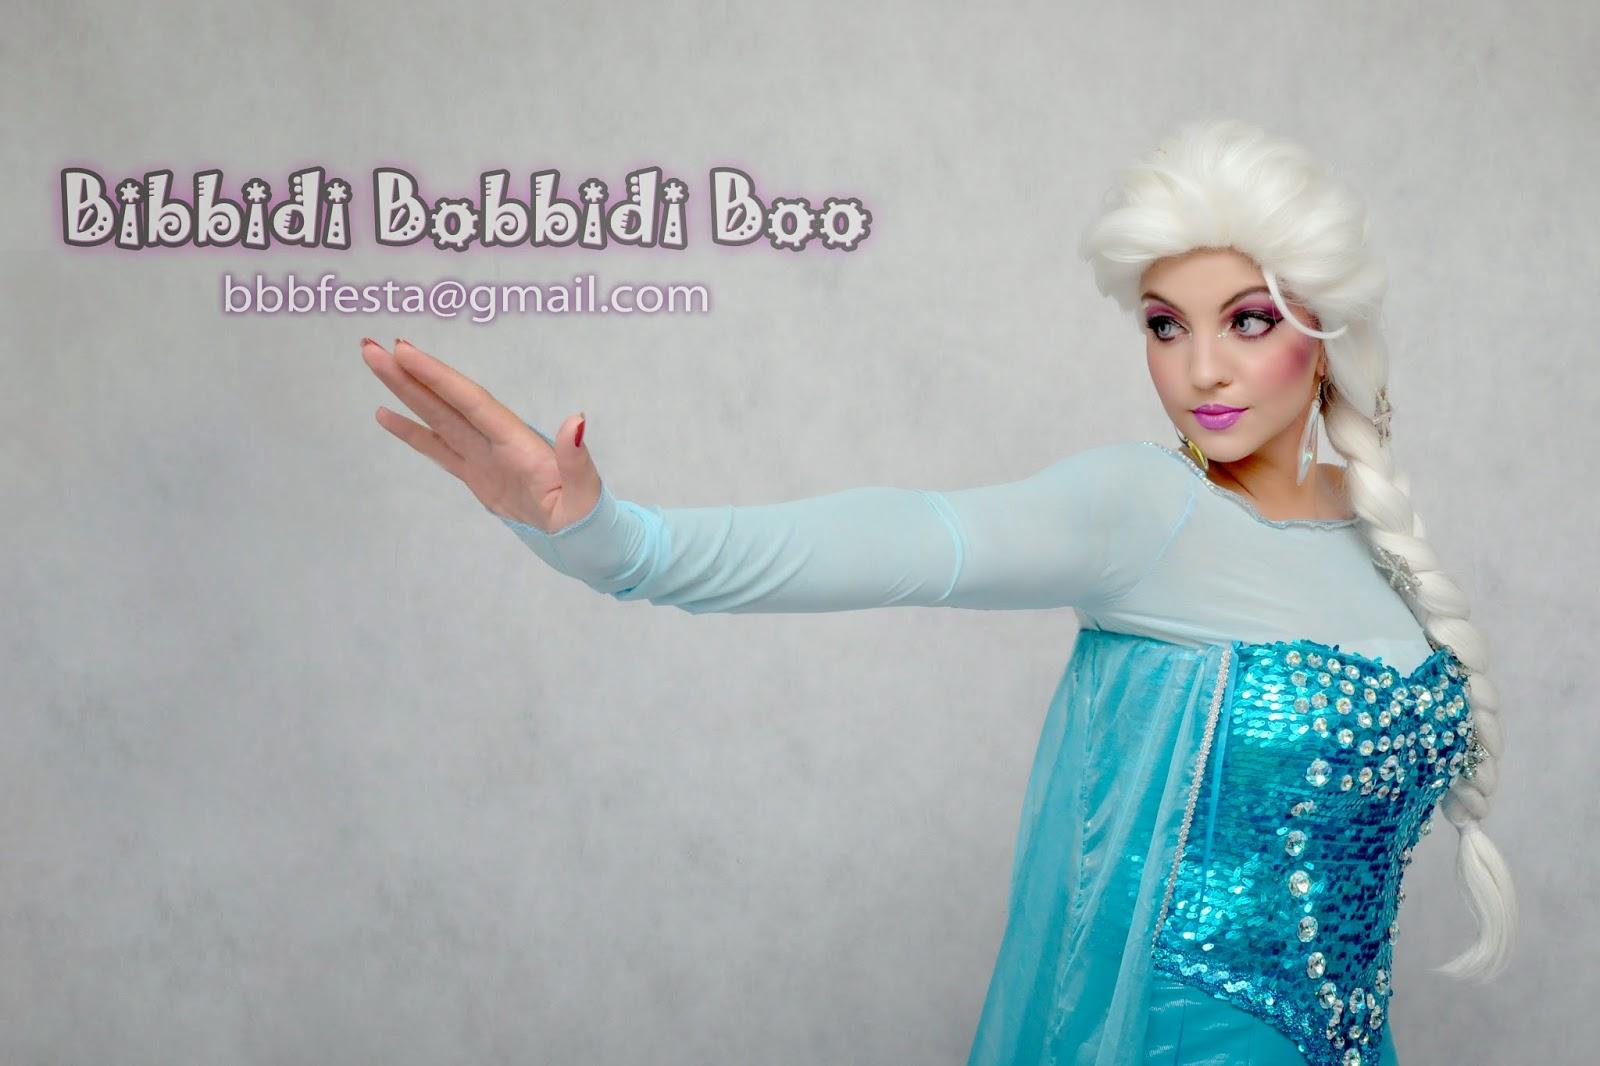 Elsa Saudades De Voces: Bibbidi Bobbidi Boo: Elas Chegaram! Personagens Vivos